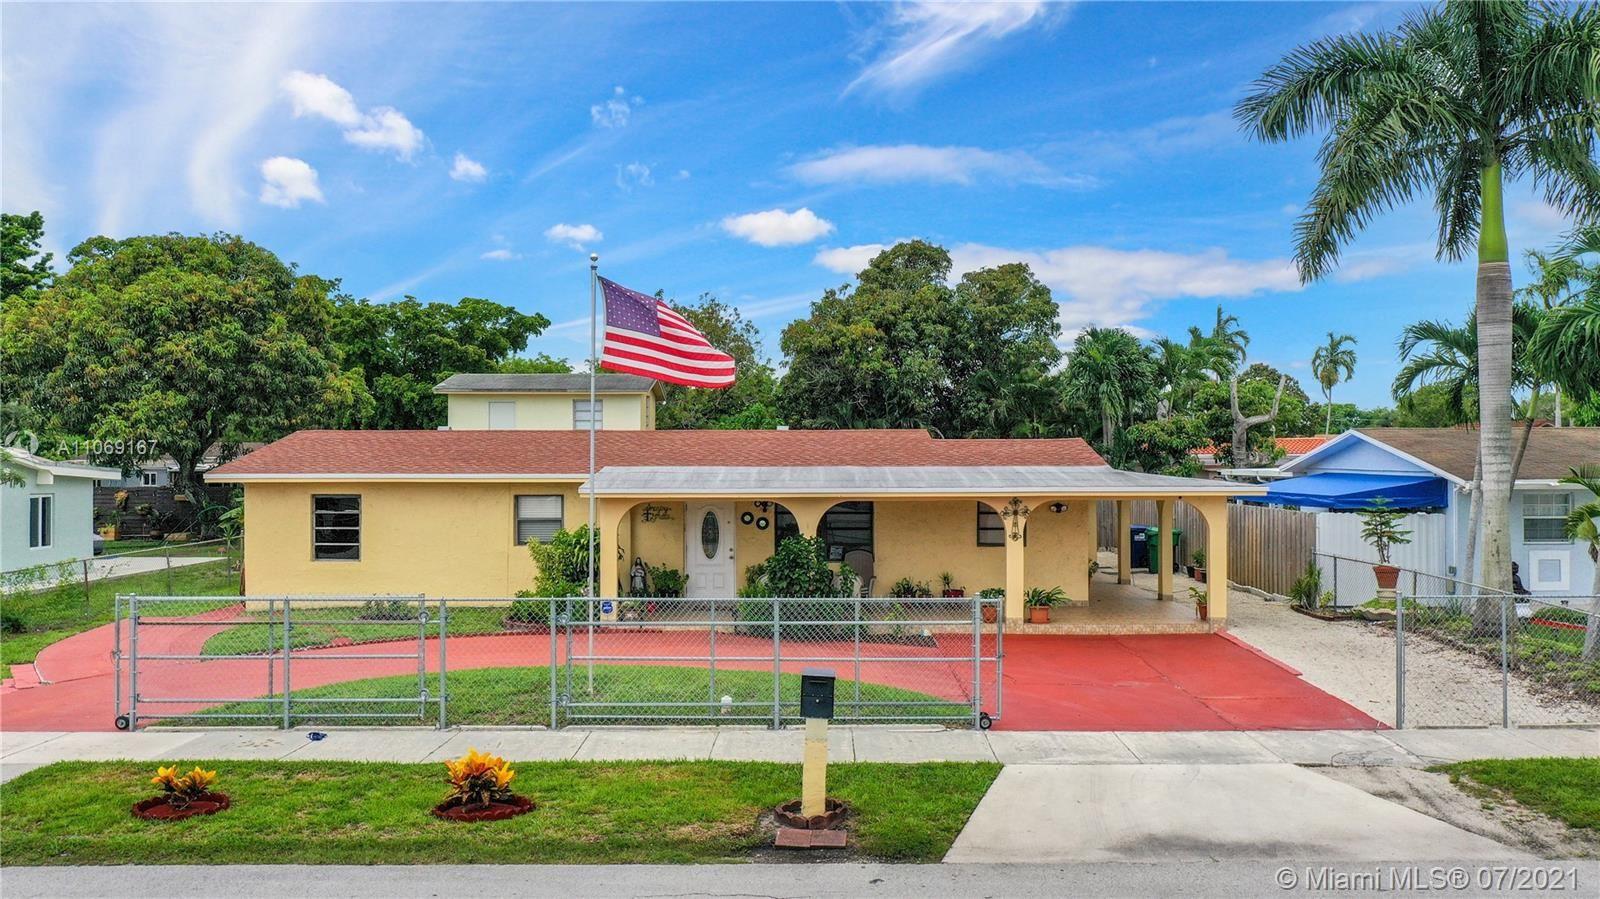 19710 NW 51st Ave, Miami Gardens, FL 33055 - #: A11069167